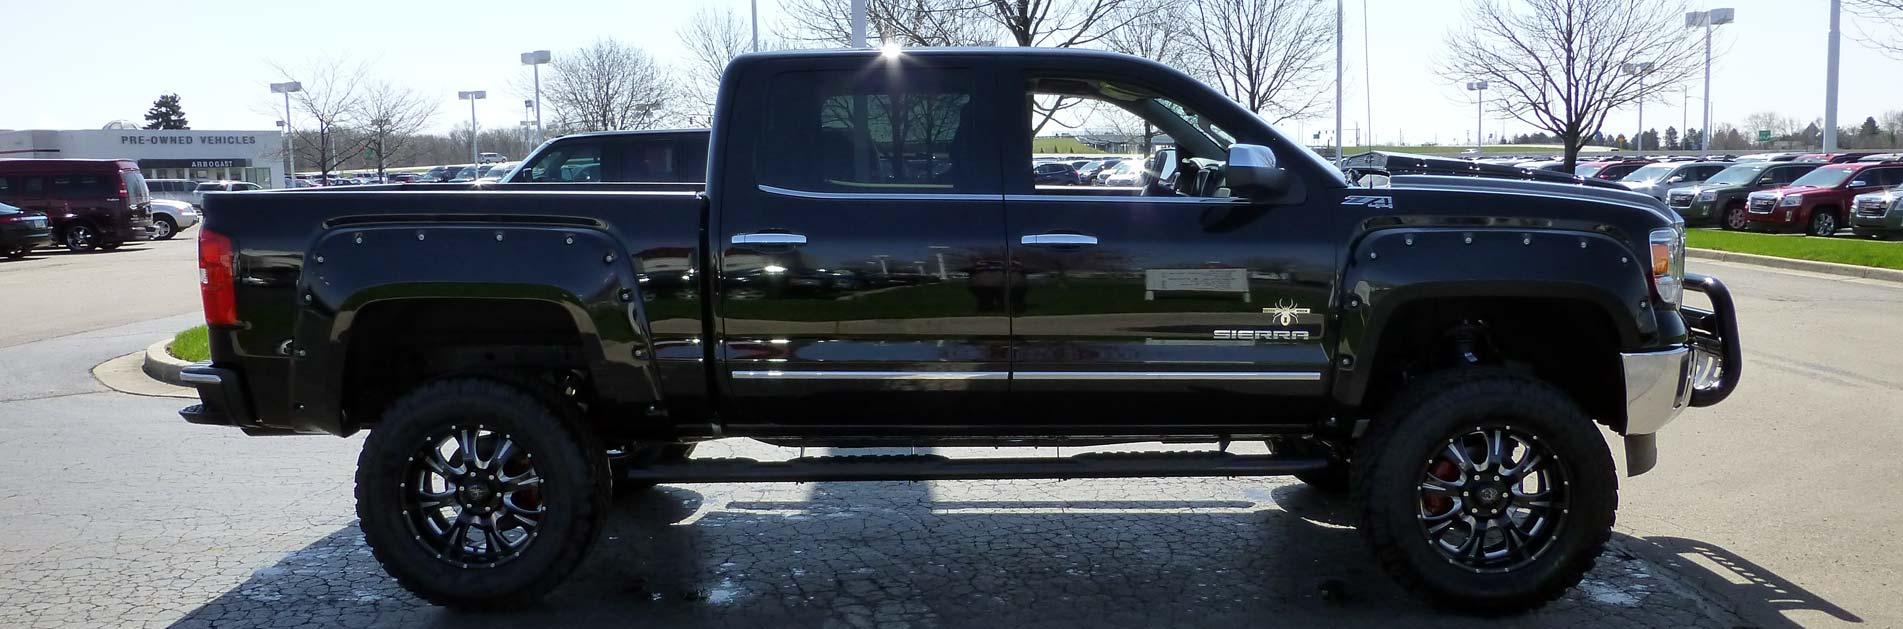 Lifted Trucks Exterior